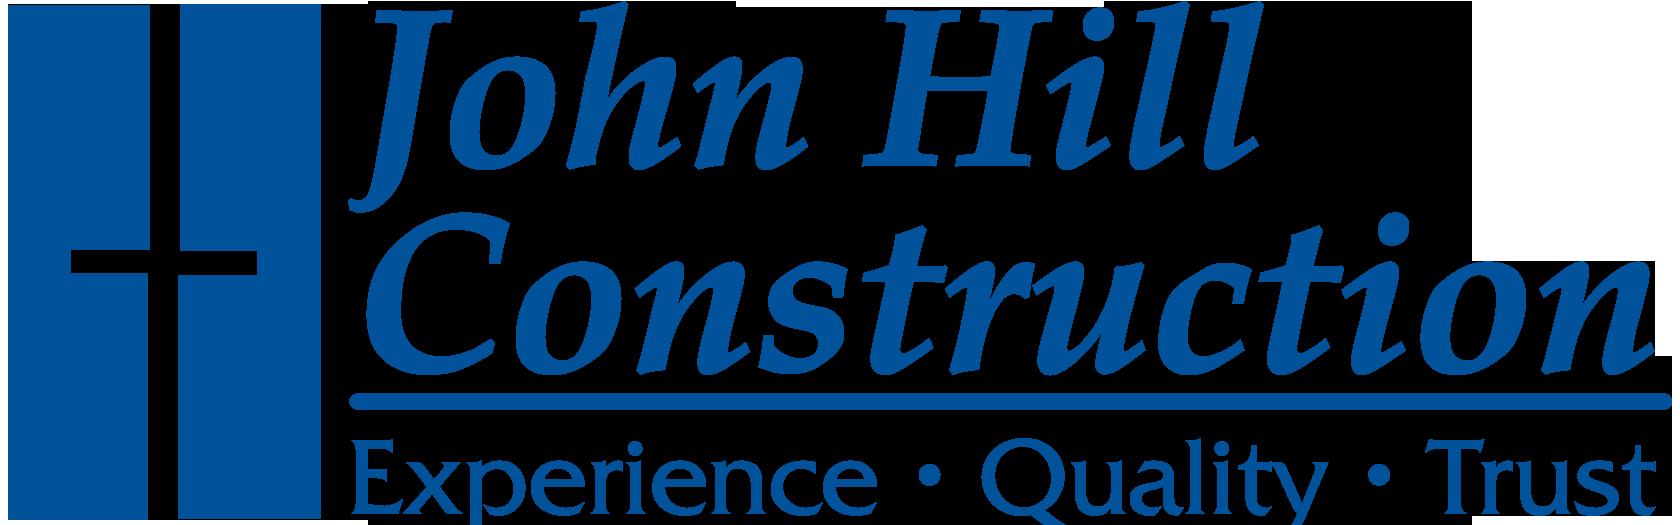 John Hill Construction